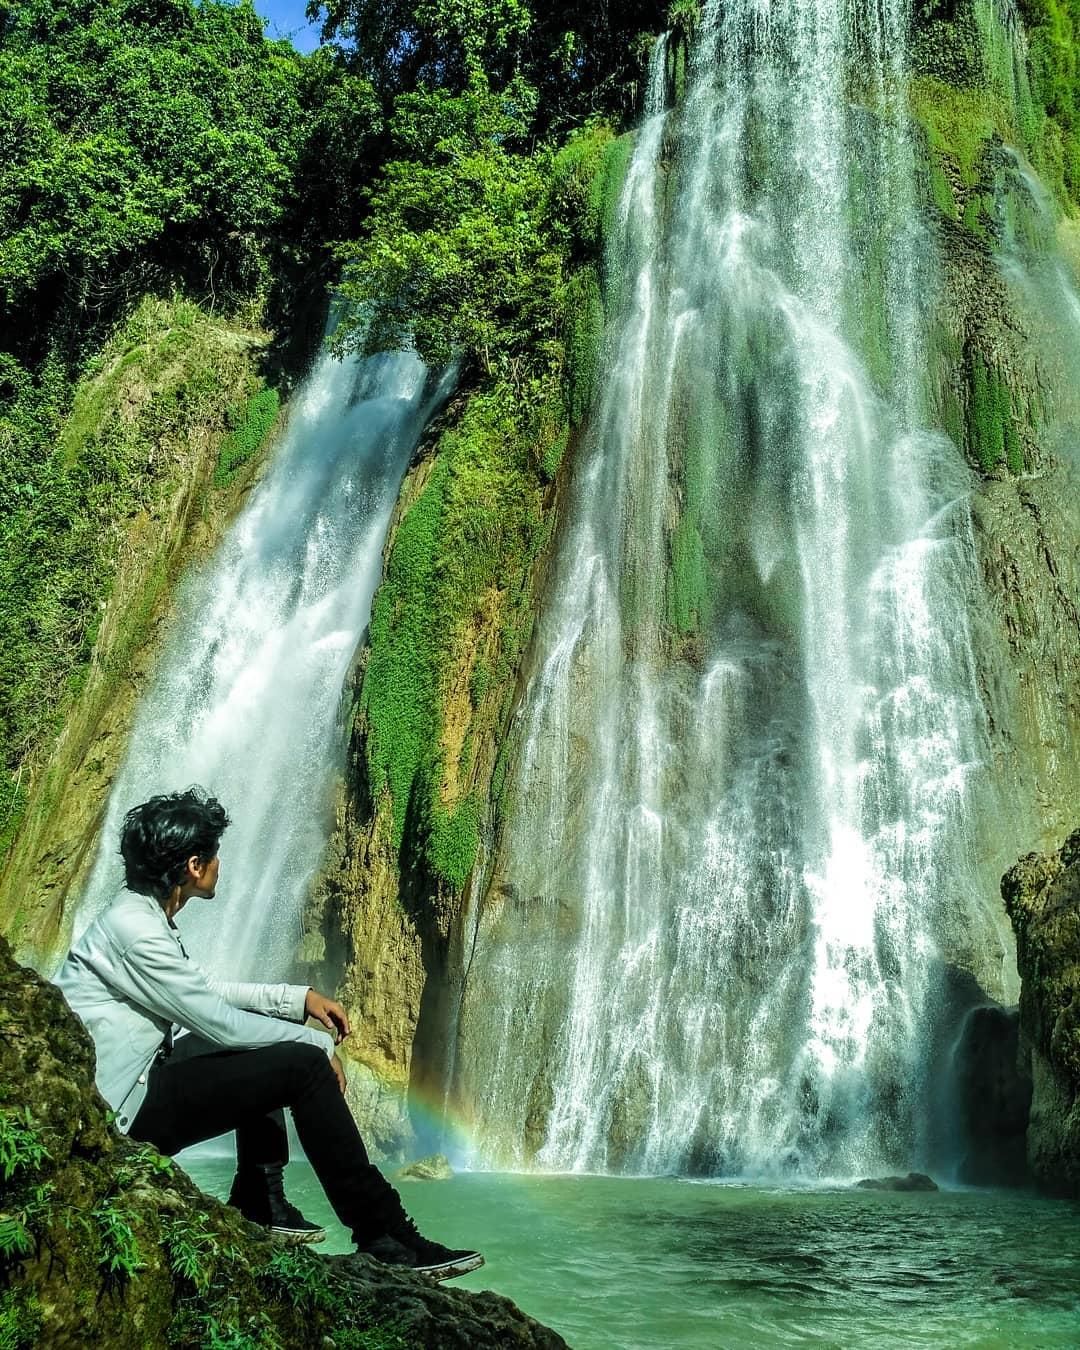 14 Tempat Wisata Alam Dan Pantai Kota Sukabumi Jawa Barat